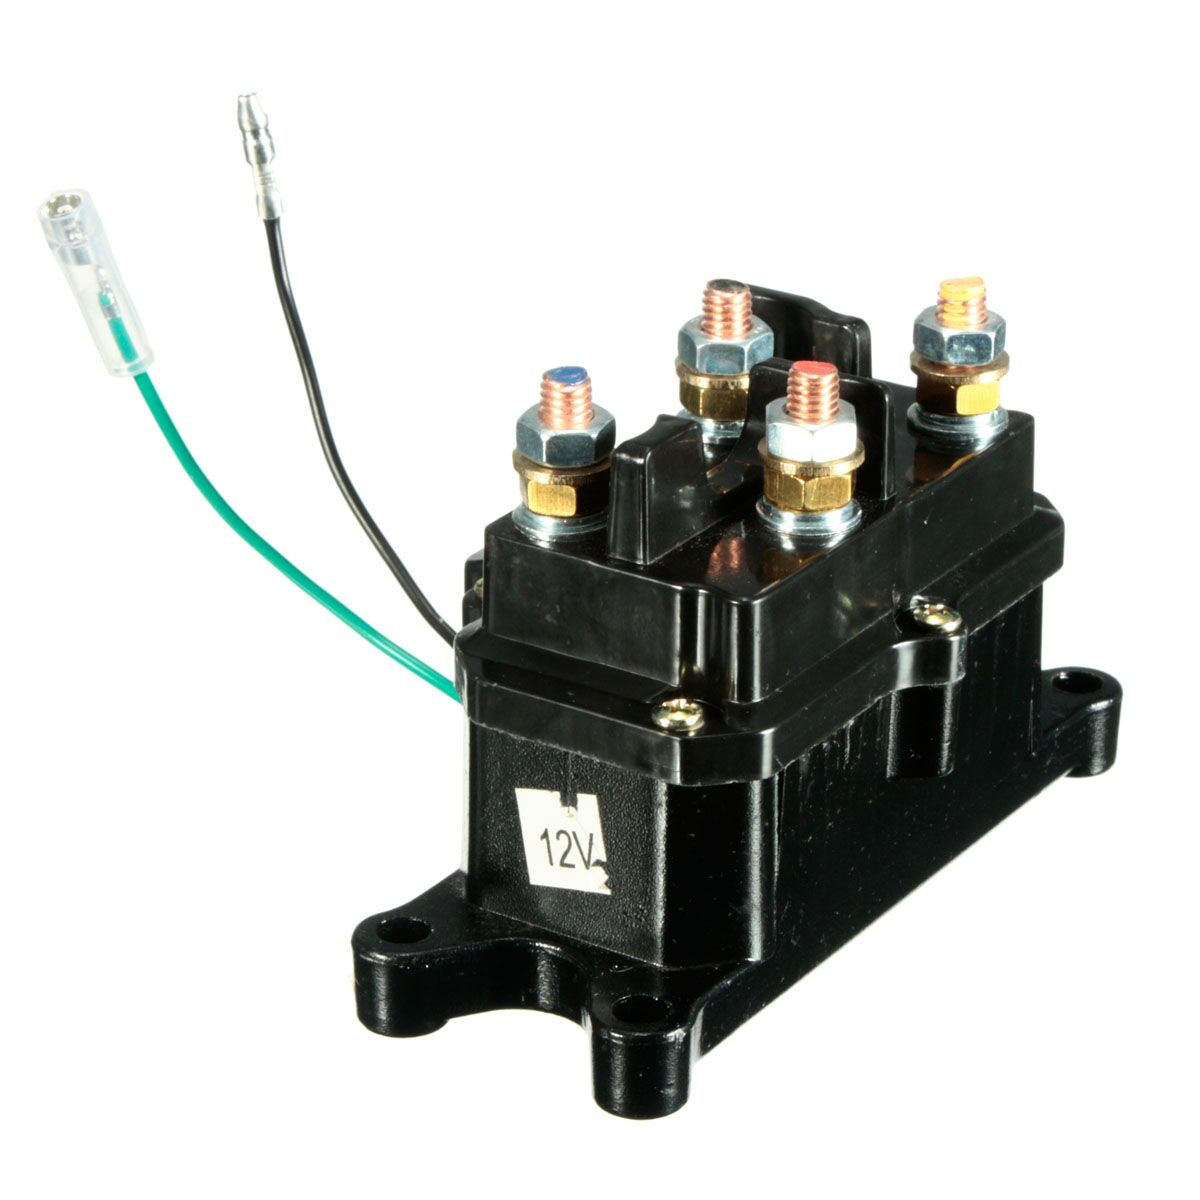 universal 12v solenoid relay contactor winch rocker switch thumb for atv utv practical 1 set [ 1200 x 1200 Pixel ]